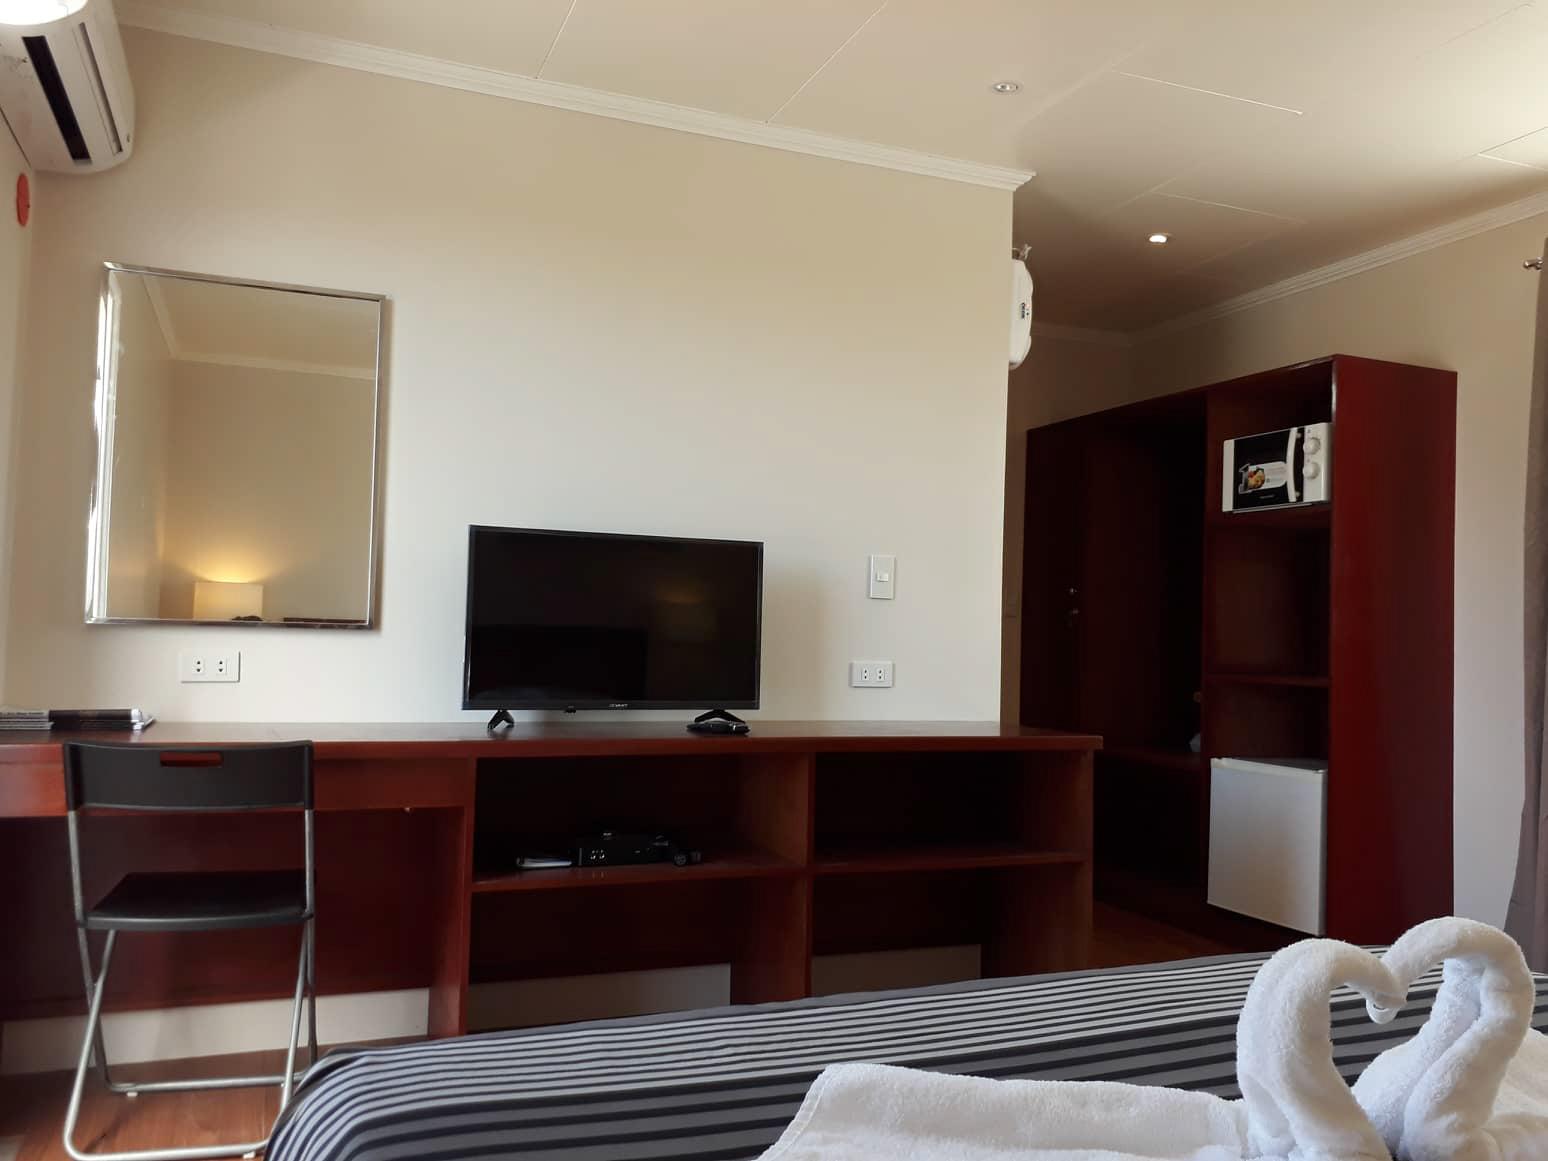 Room 8 Cabinets